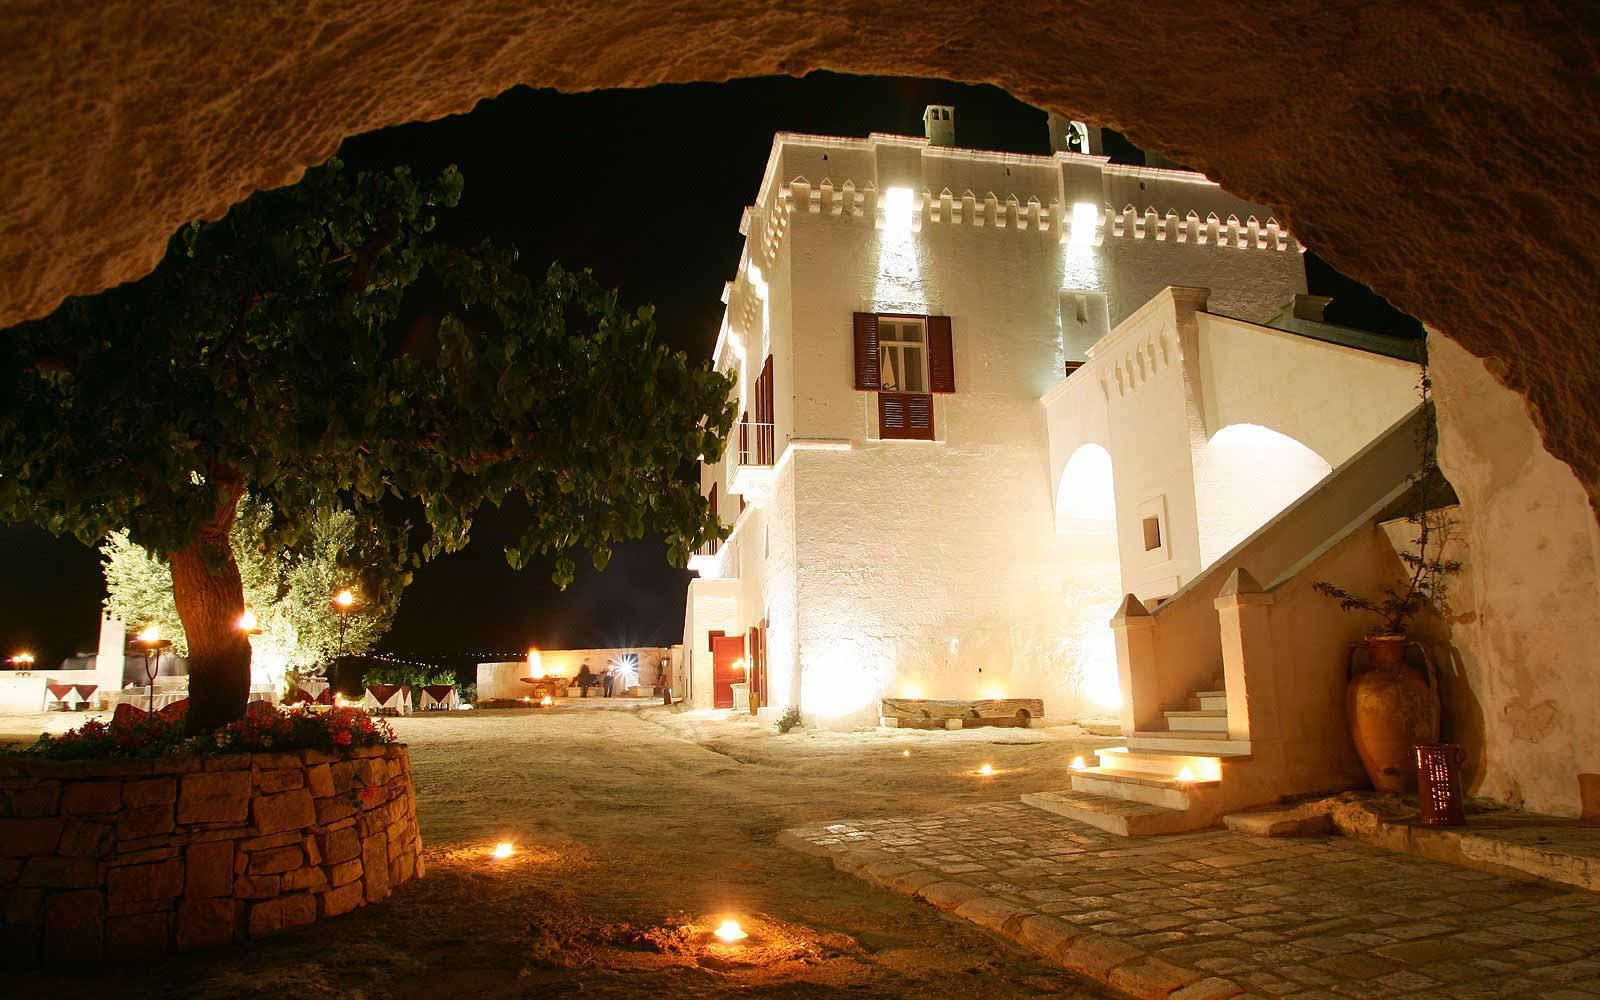 Masseria Torre Coccaro at night